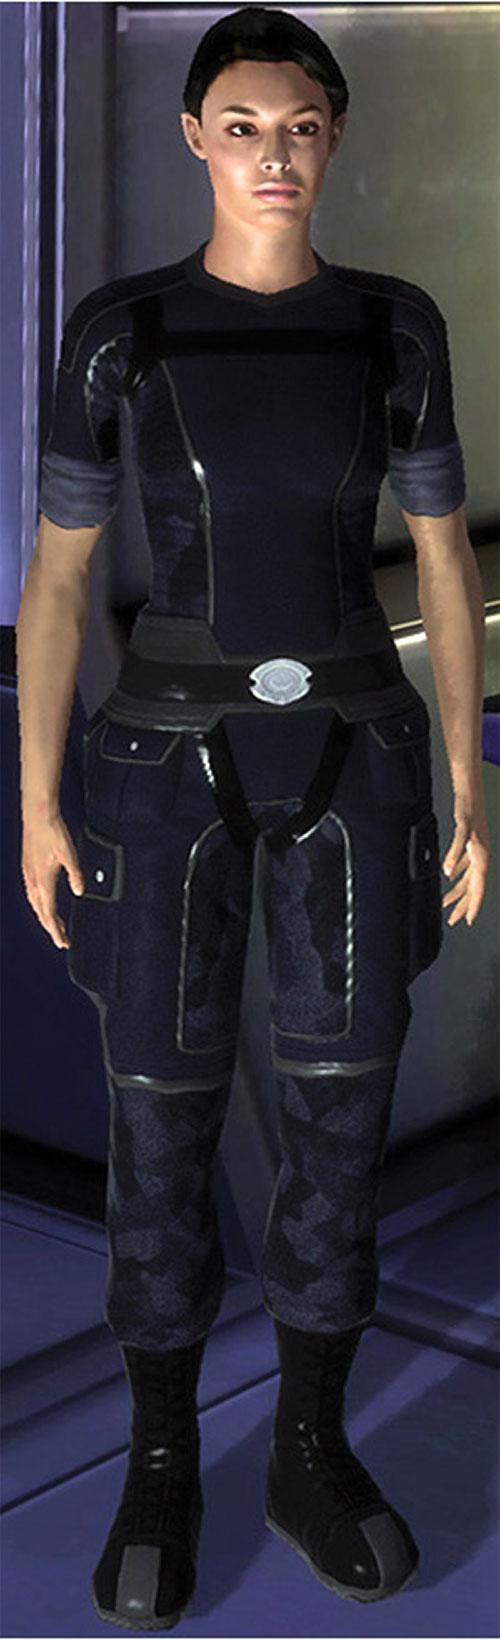 Ashley Williams in Mass Effect 1 - in blue uniform